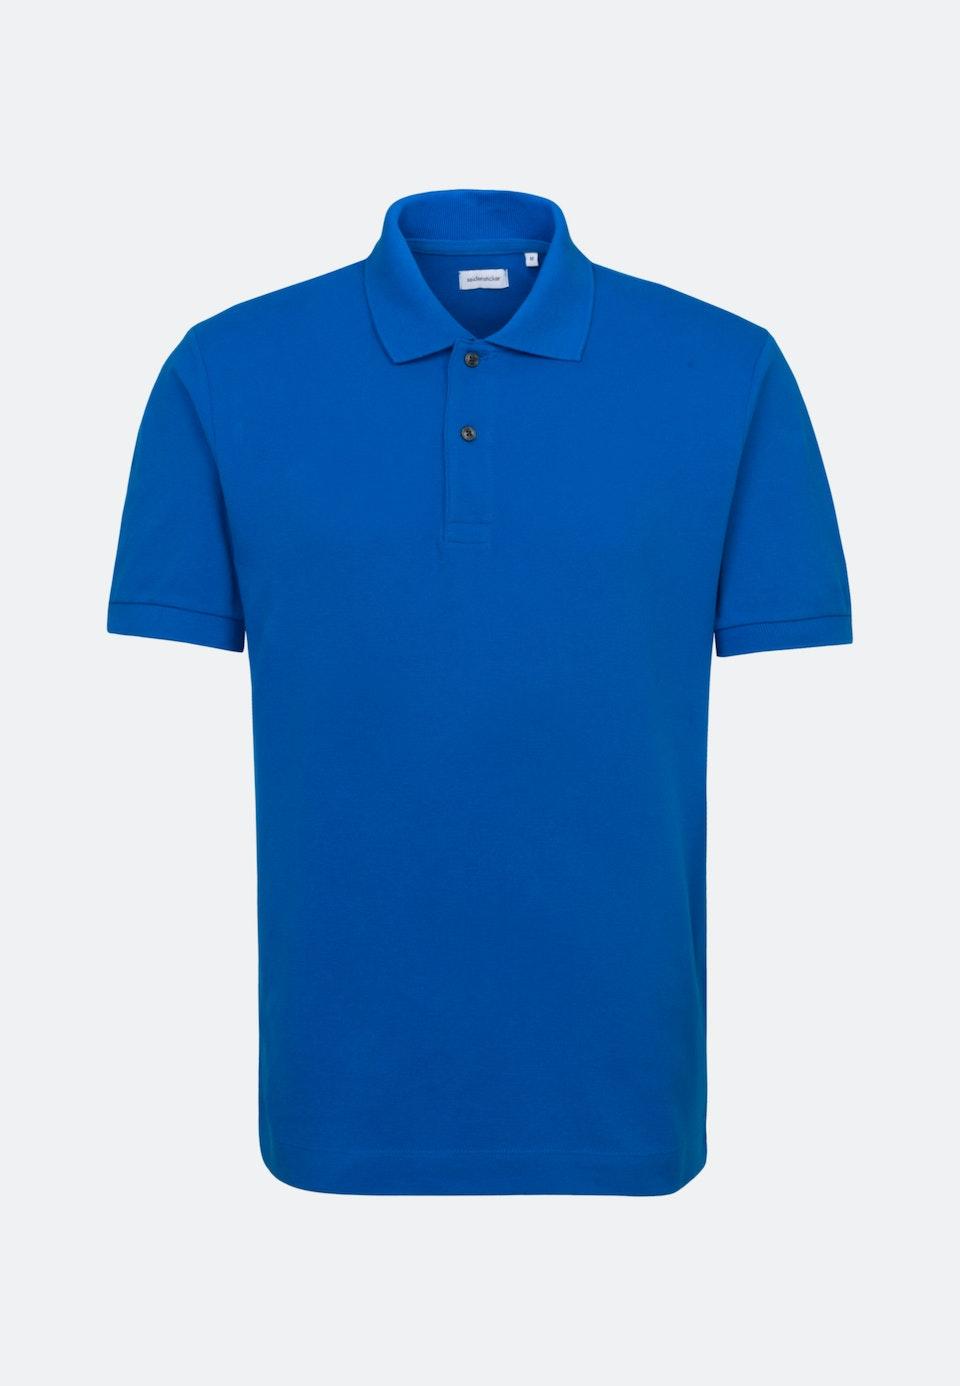 Polo-Shirt made of 100% Cotton in Medium blue |  Seidensticker Onlineshop